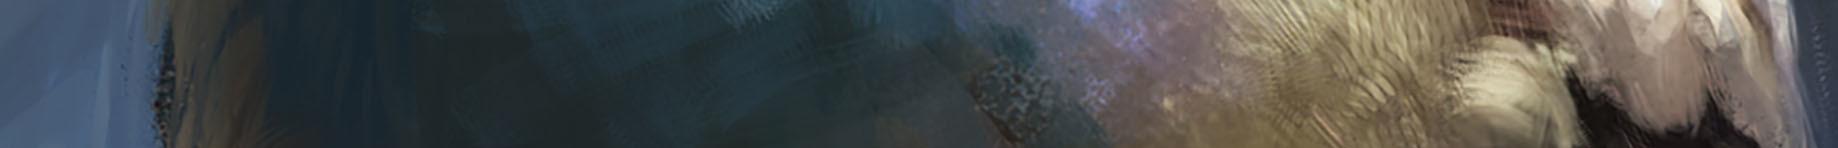 <div class='title'>           billboardoptions-0038-Layer-58-anea69         </div>